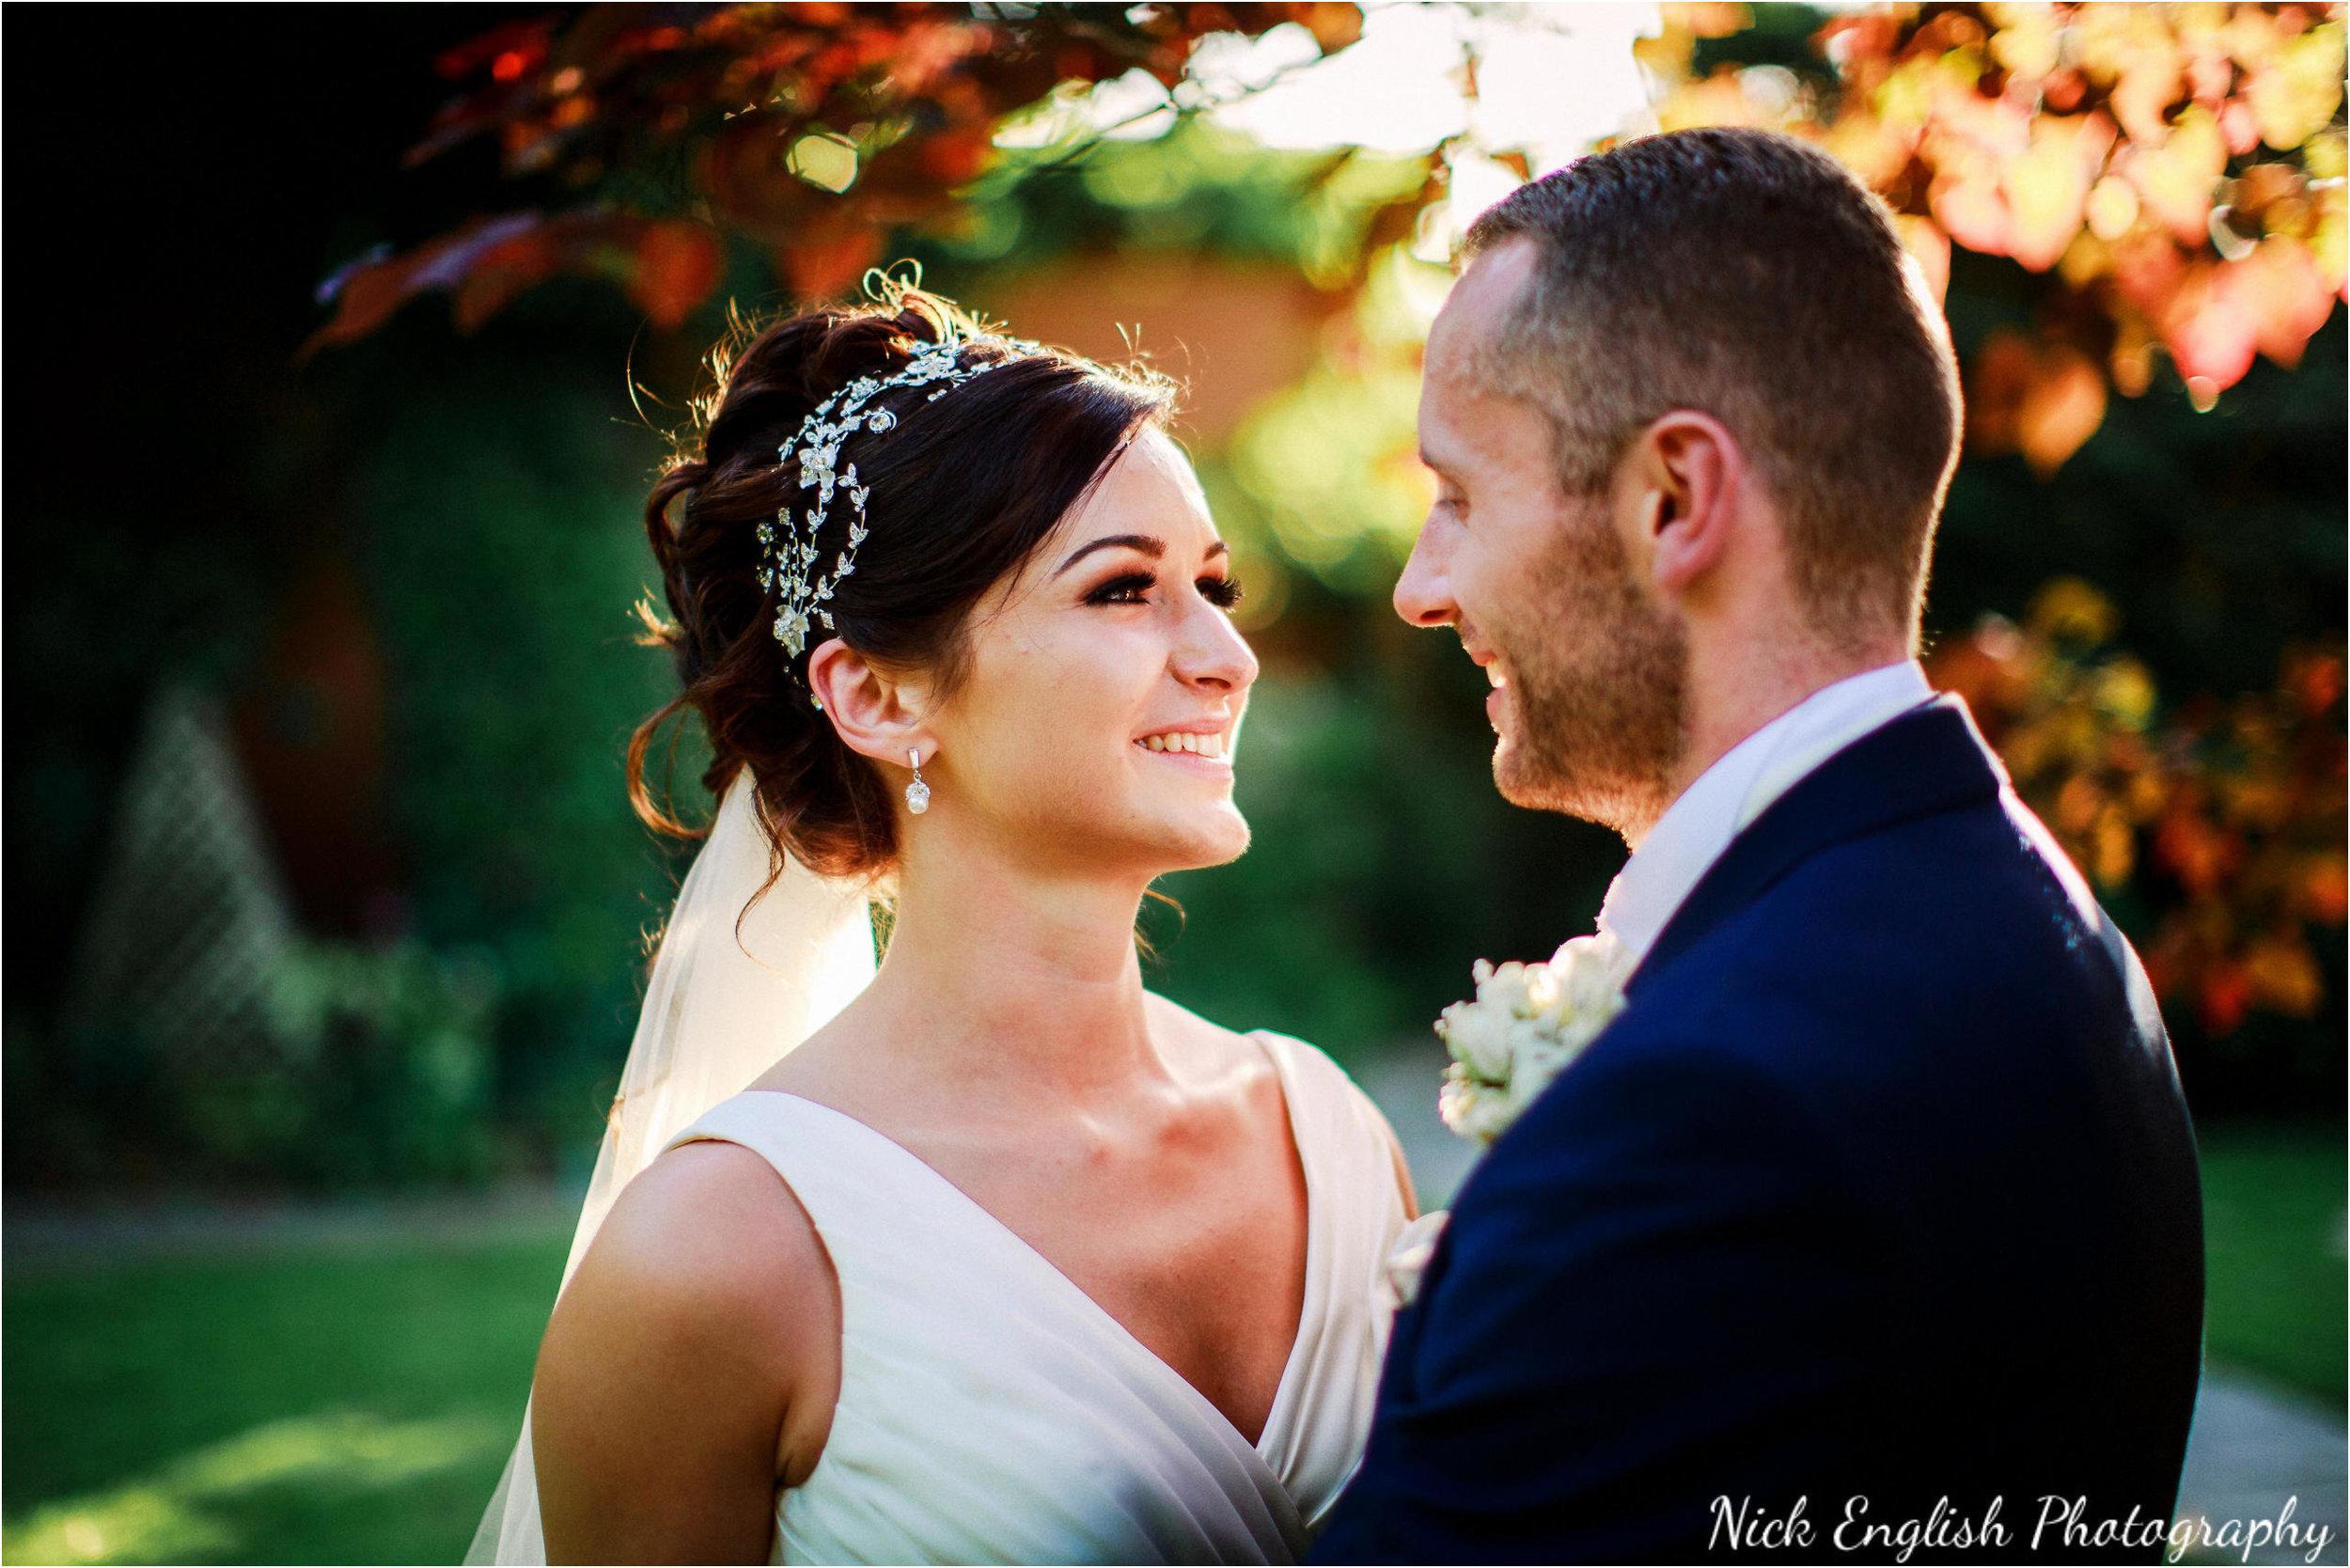 Emily David Wedding Photographs at Barton Grange Preston by Nick English Photography 195jpg.jpeg